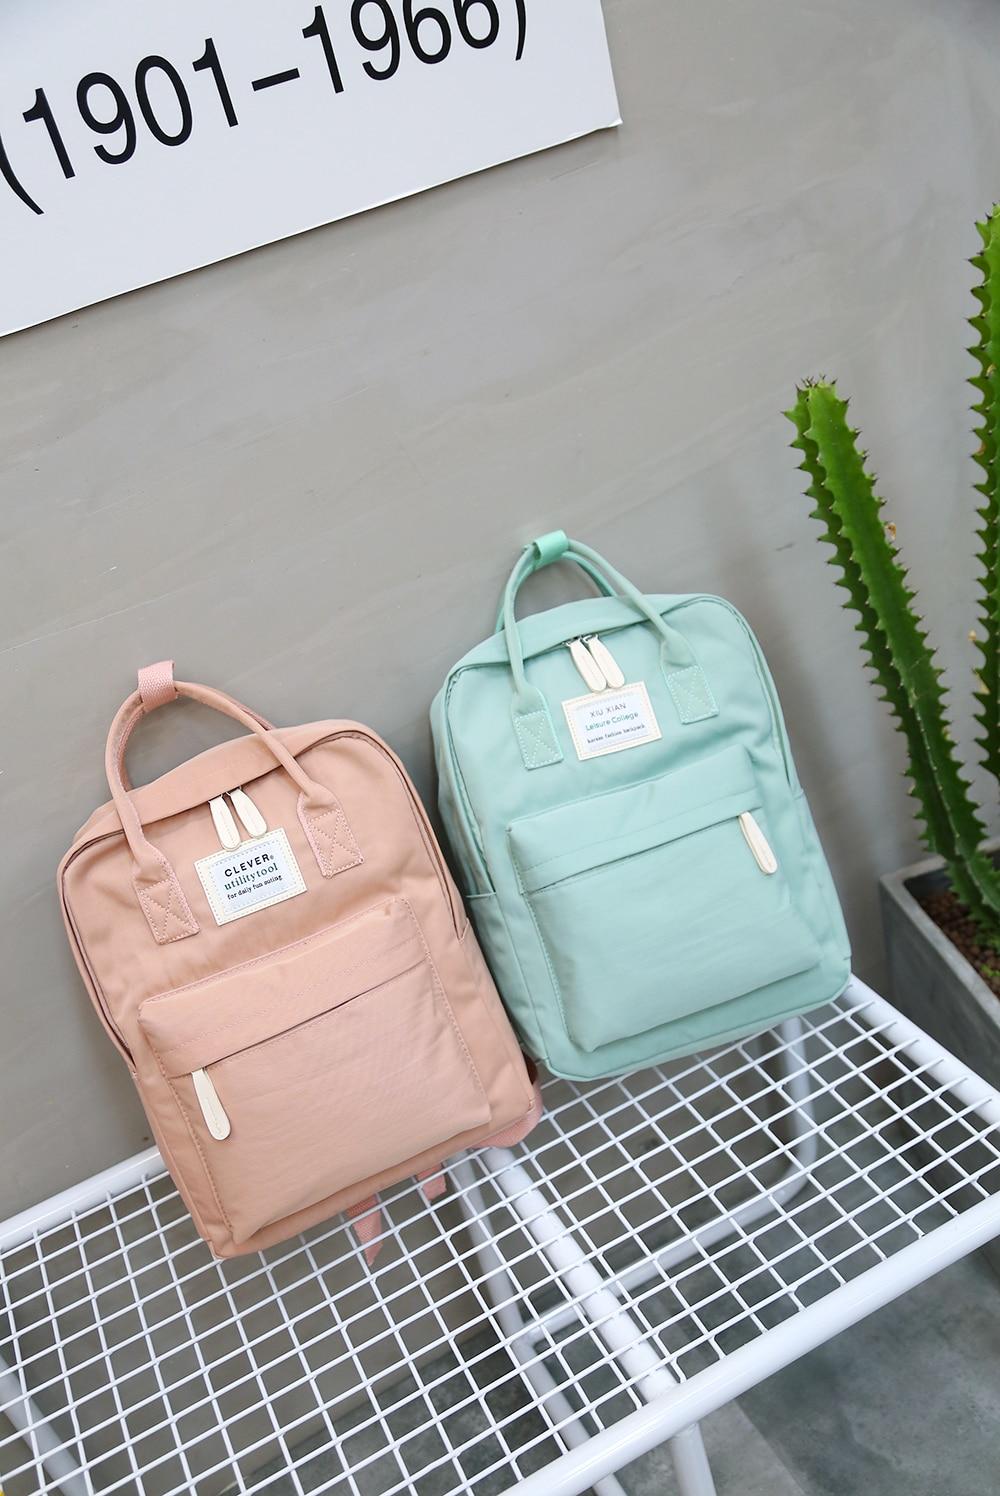 HTB1bT CfljTBKNjSZFNq6ysFXXaV Multifunction women backpack fashion youth korean style shoulder bag laptop backpack schoolbags for teenager girls boys travel